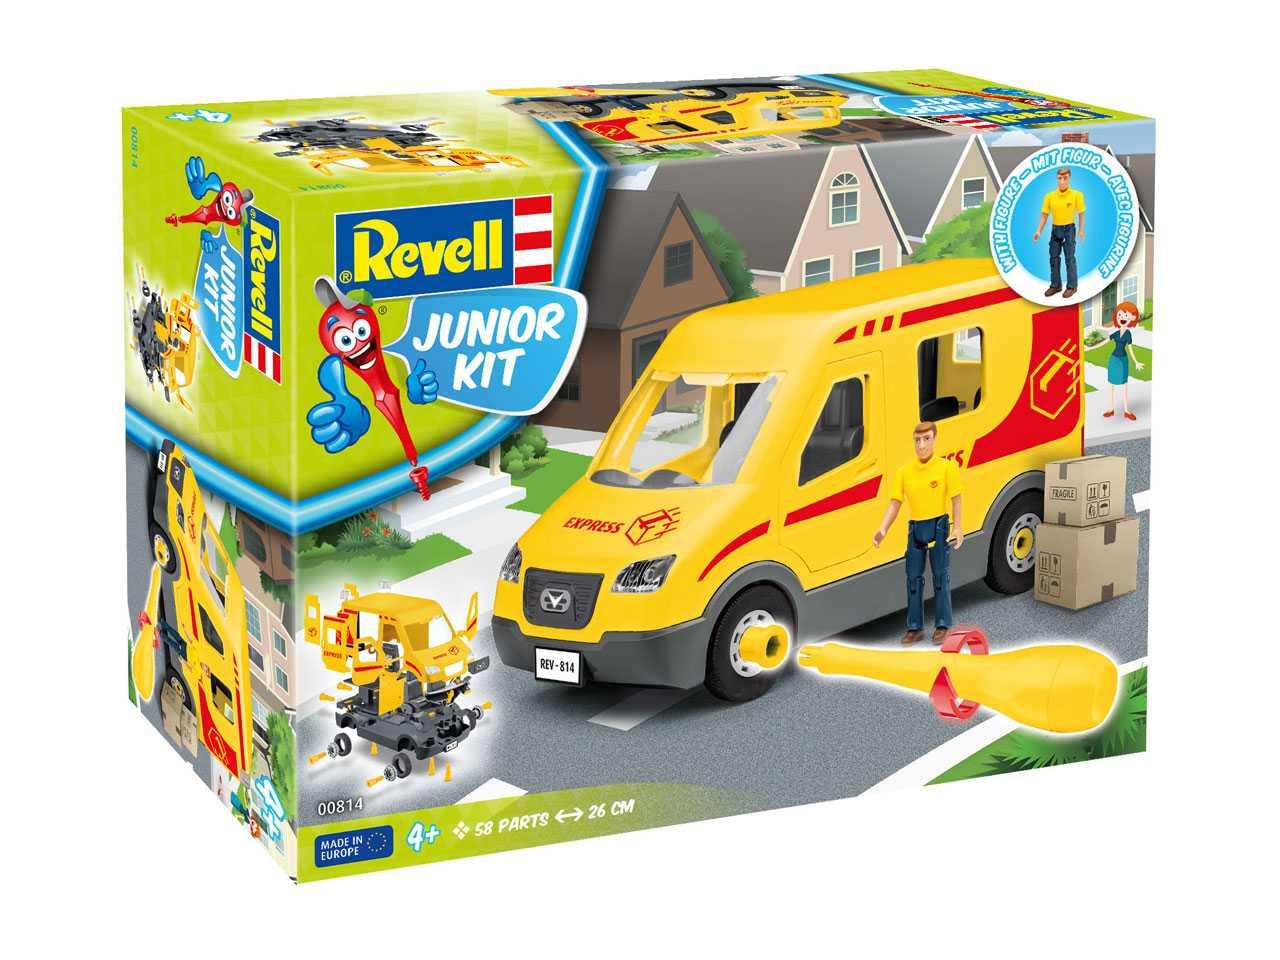 Junior Kit auto 00814 - Delivery Truck incl. Figure (1:20)